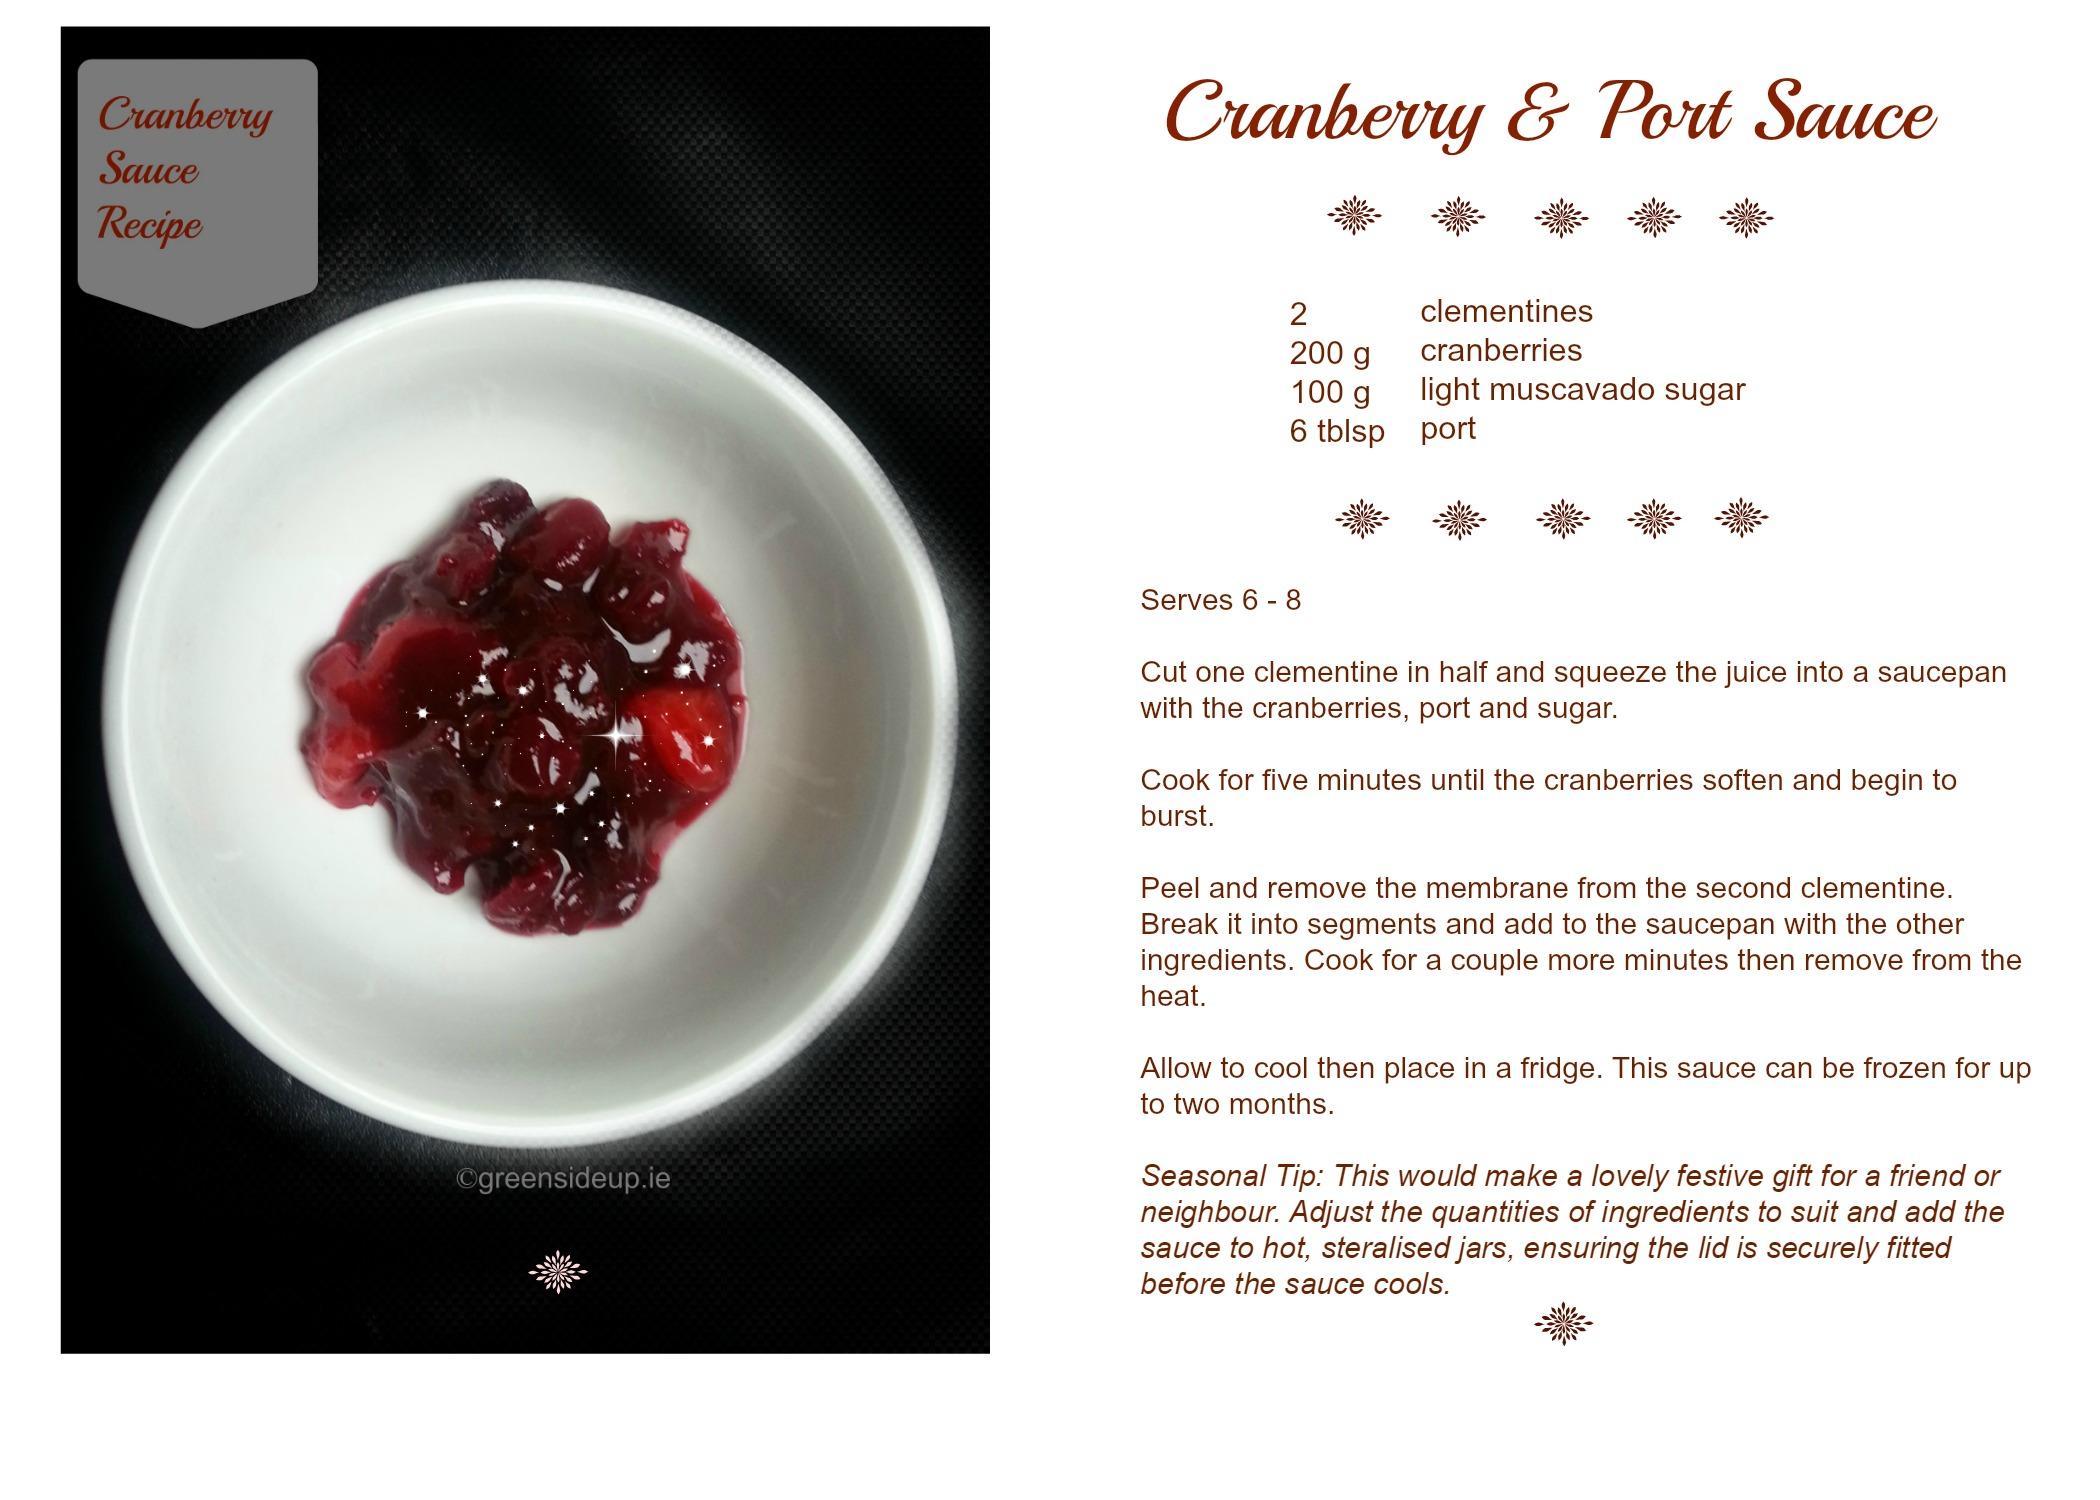 Cranberry Sauce Recipe Card